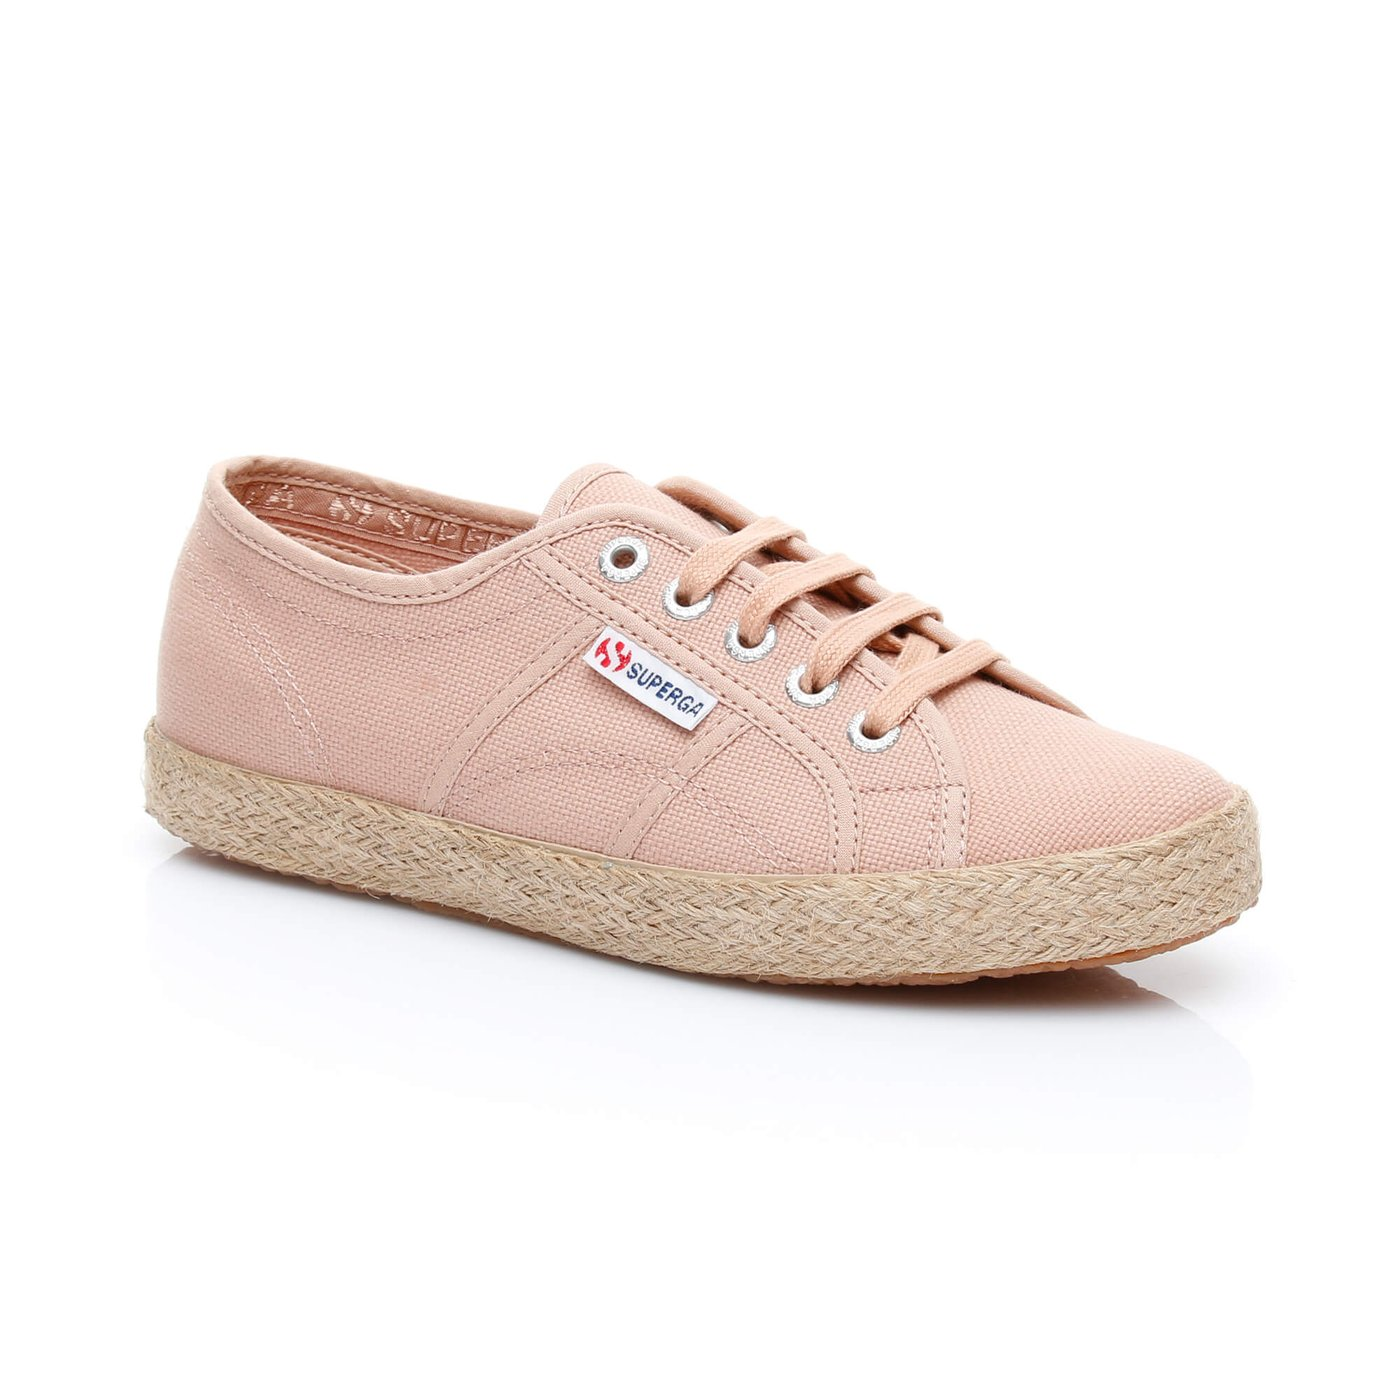 Superga 2750 Cotropeu Kadın Pembe Sneaker